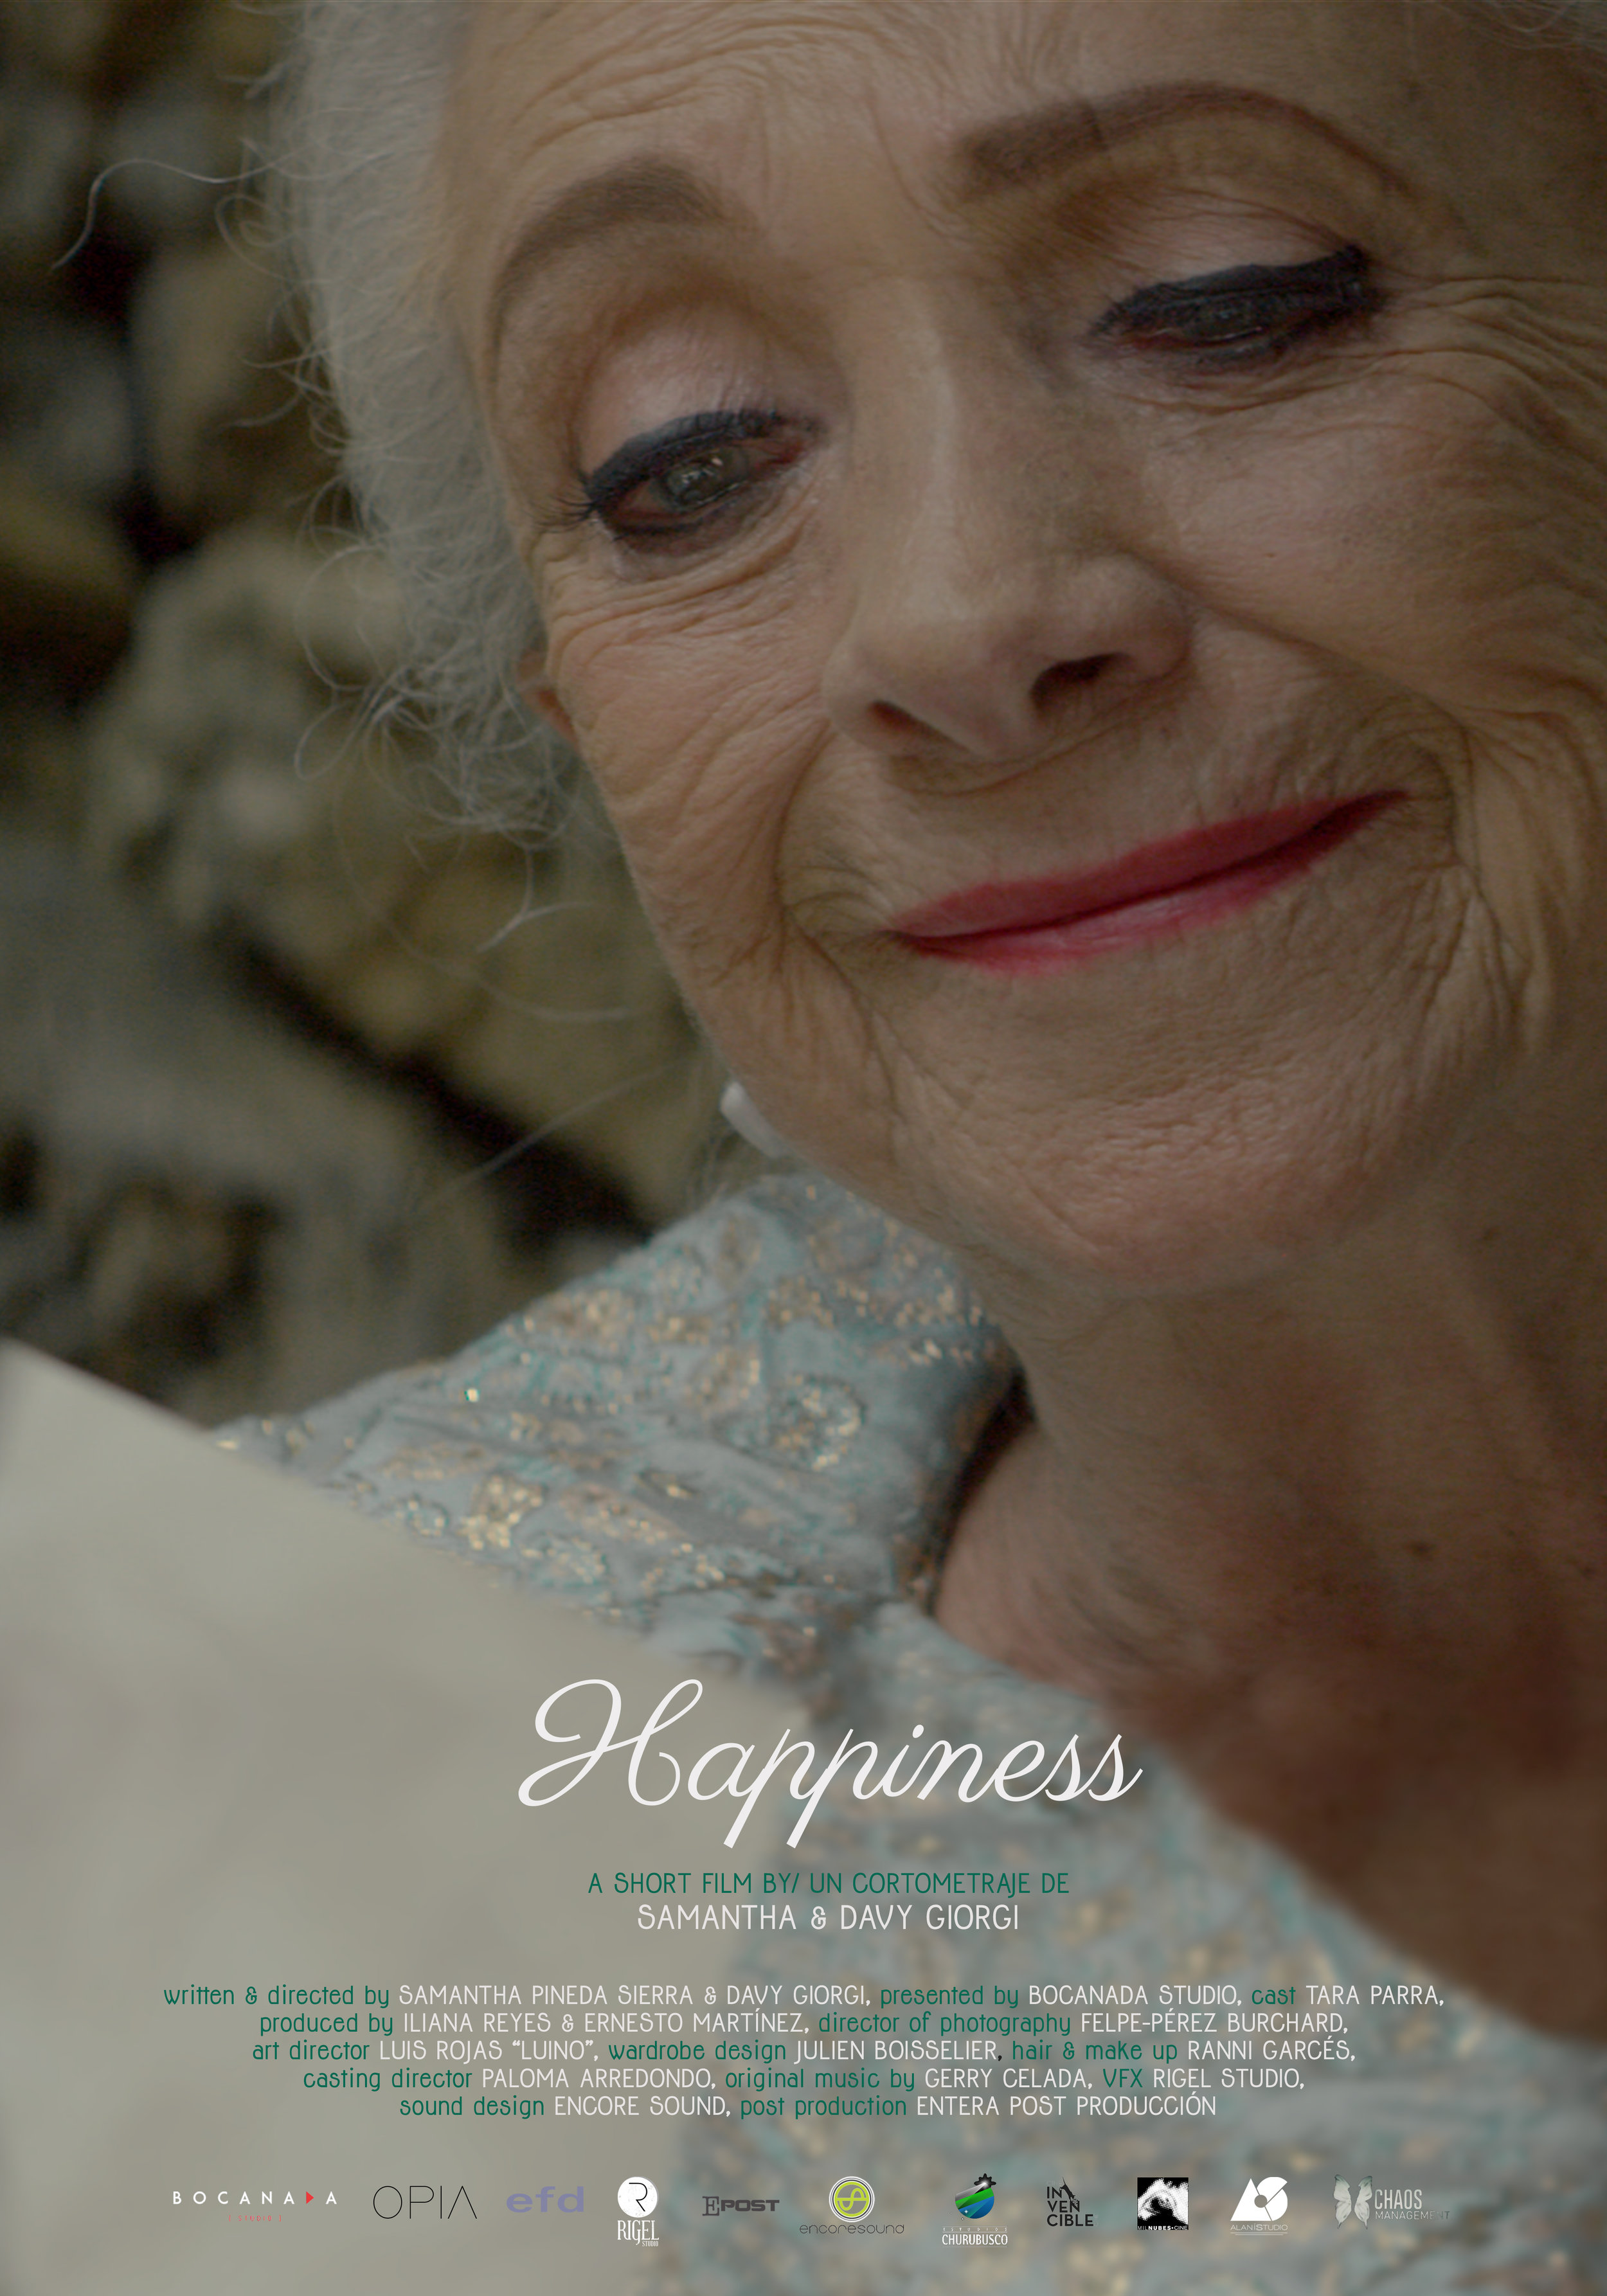 "We had the honor to present ""Happiness"" at the 32nd Festival International de Cine en Guadalajara (FICG 32) last weekend."